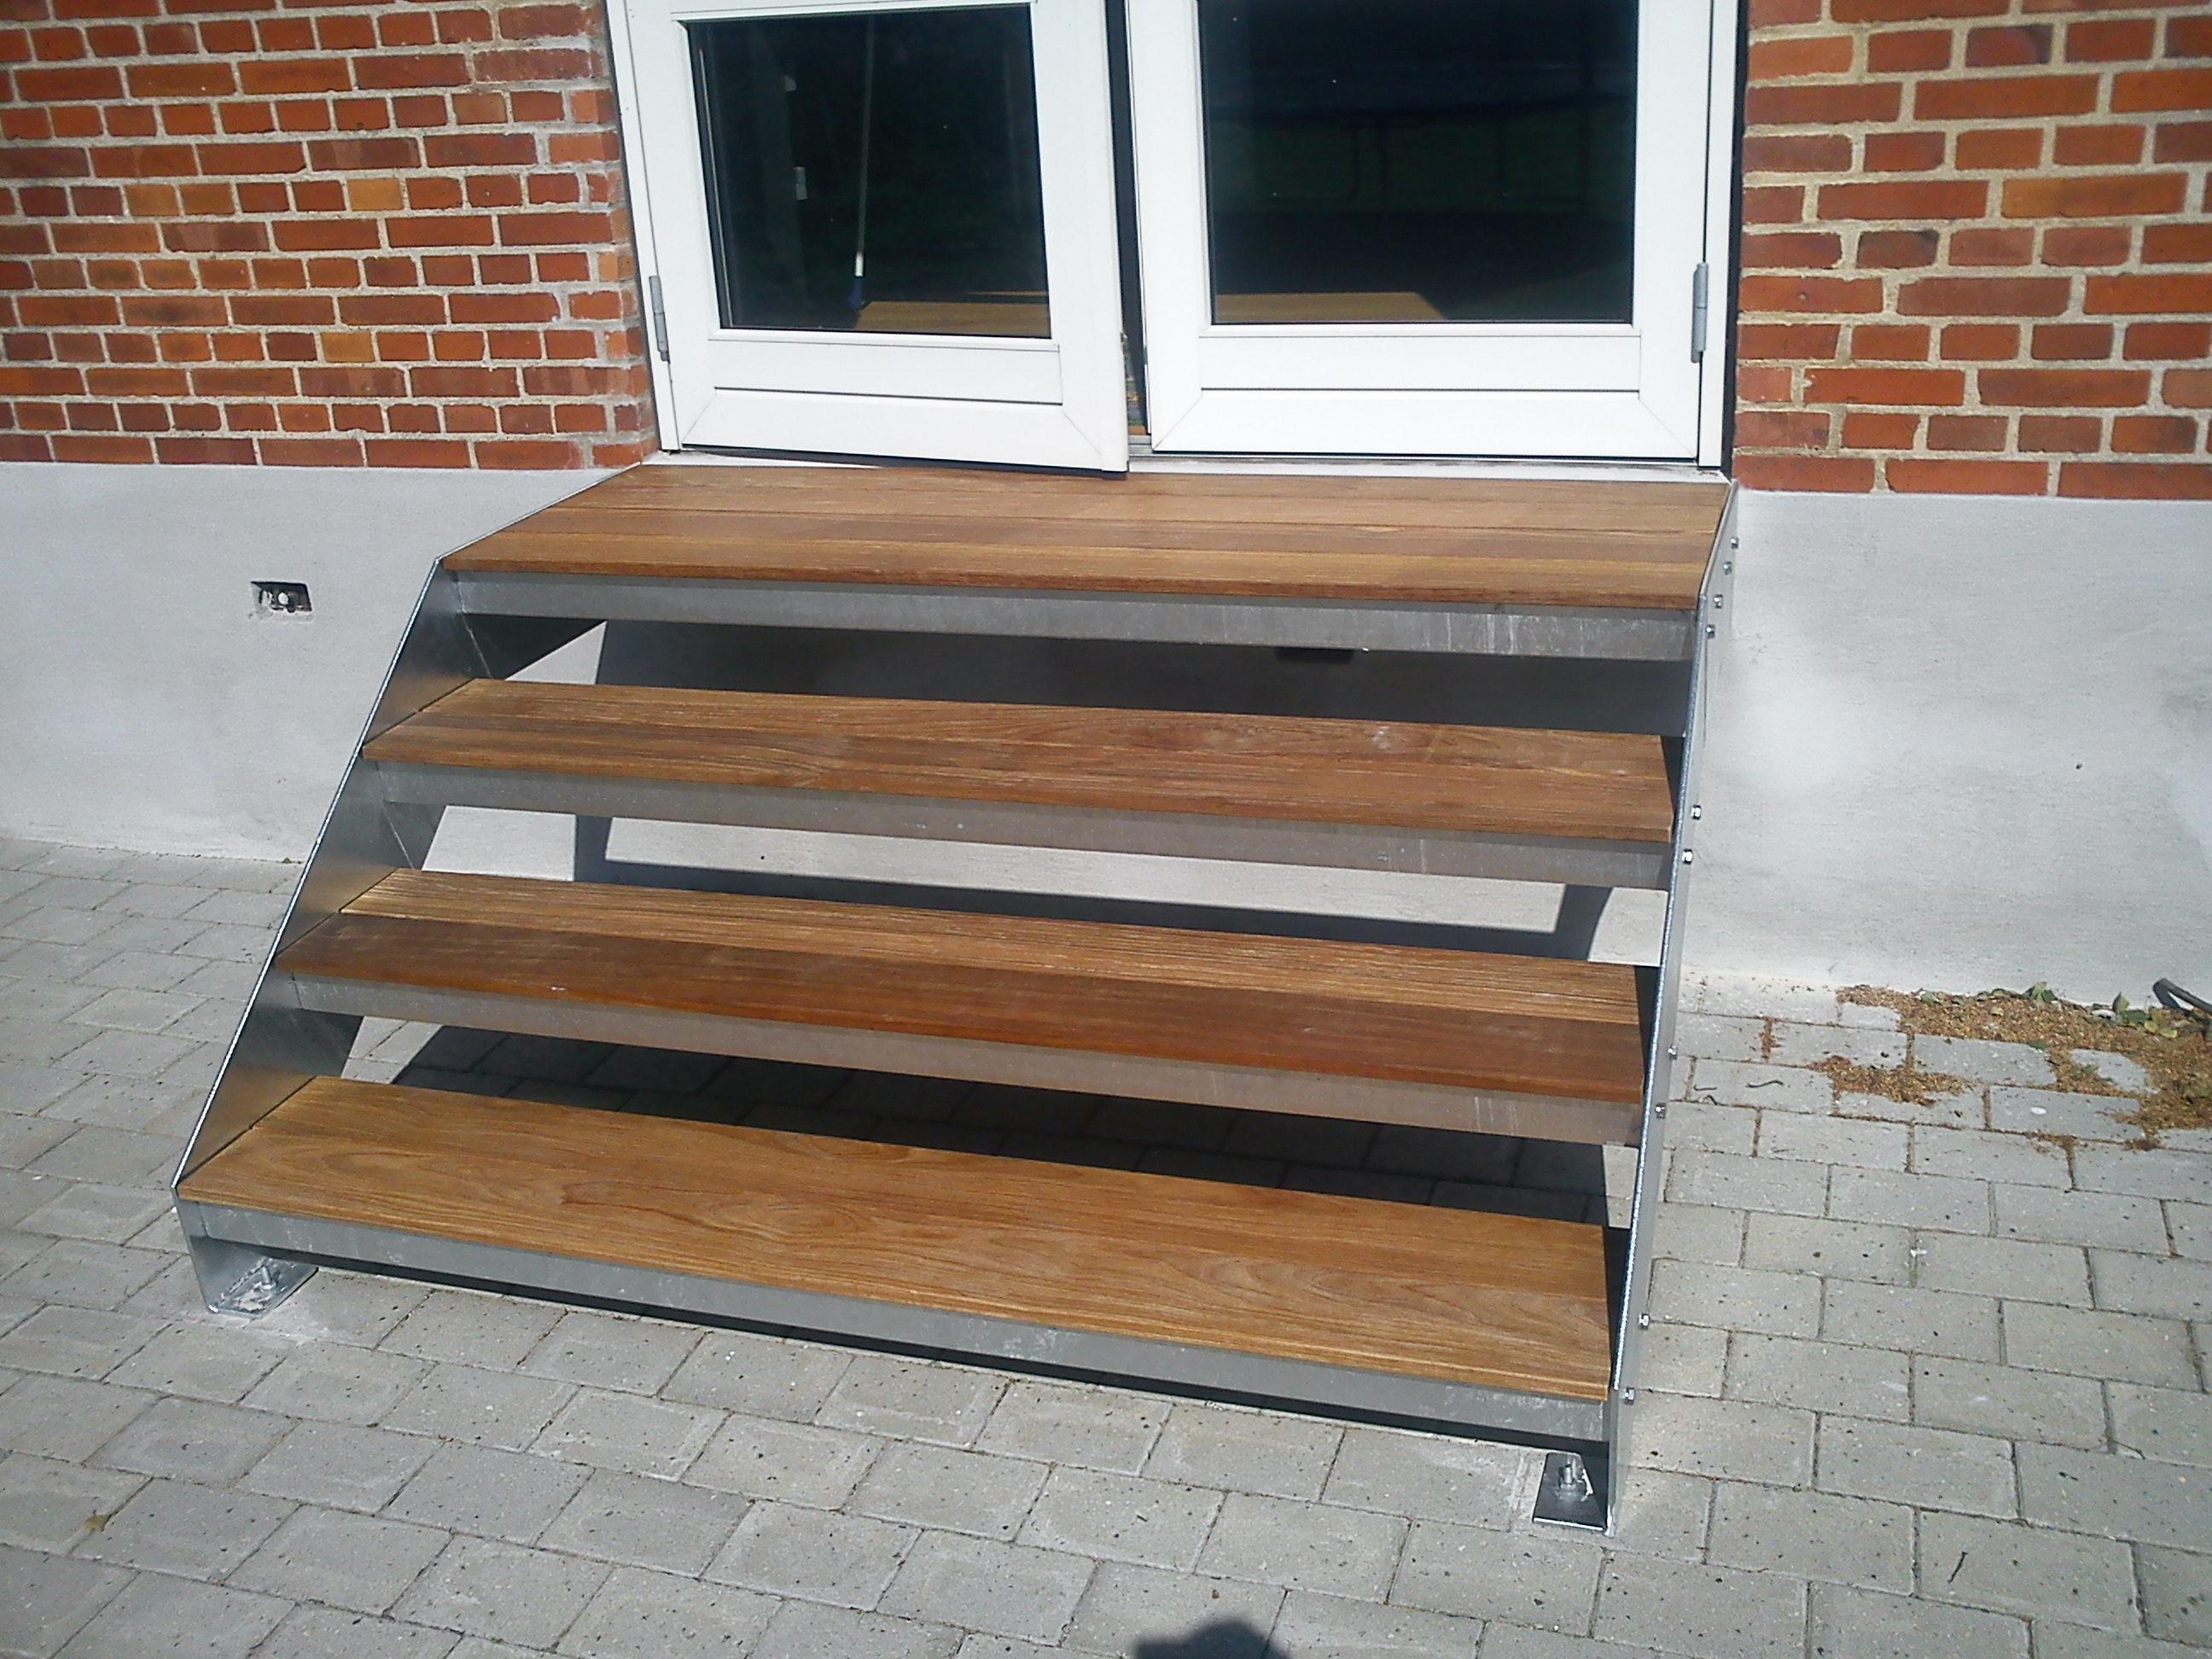 terrassetrappe-galvcumaru-haardttrae_3-trinrepos_dsc00164